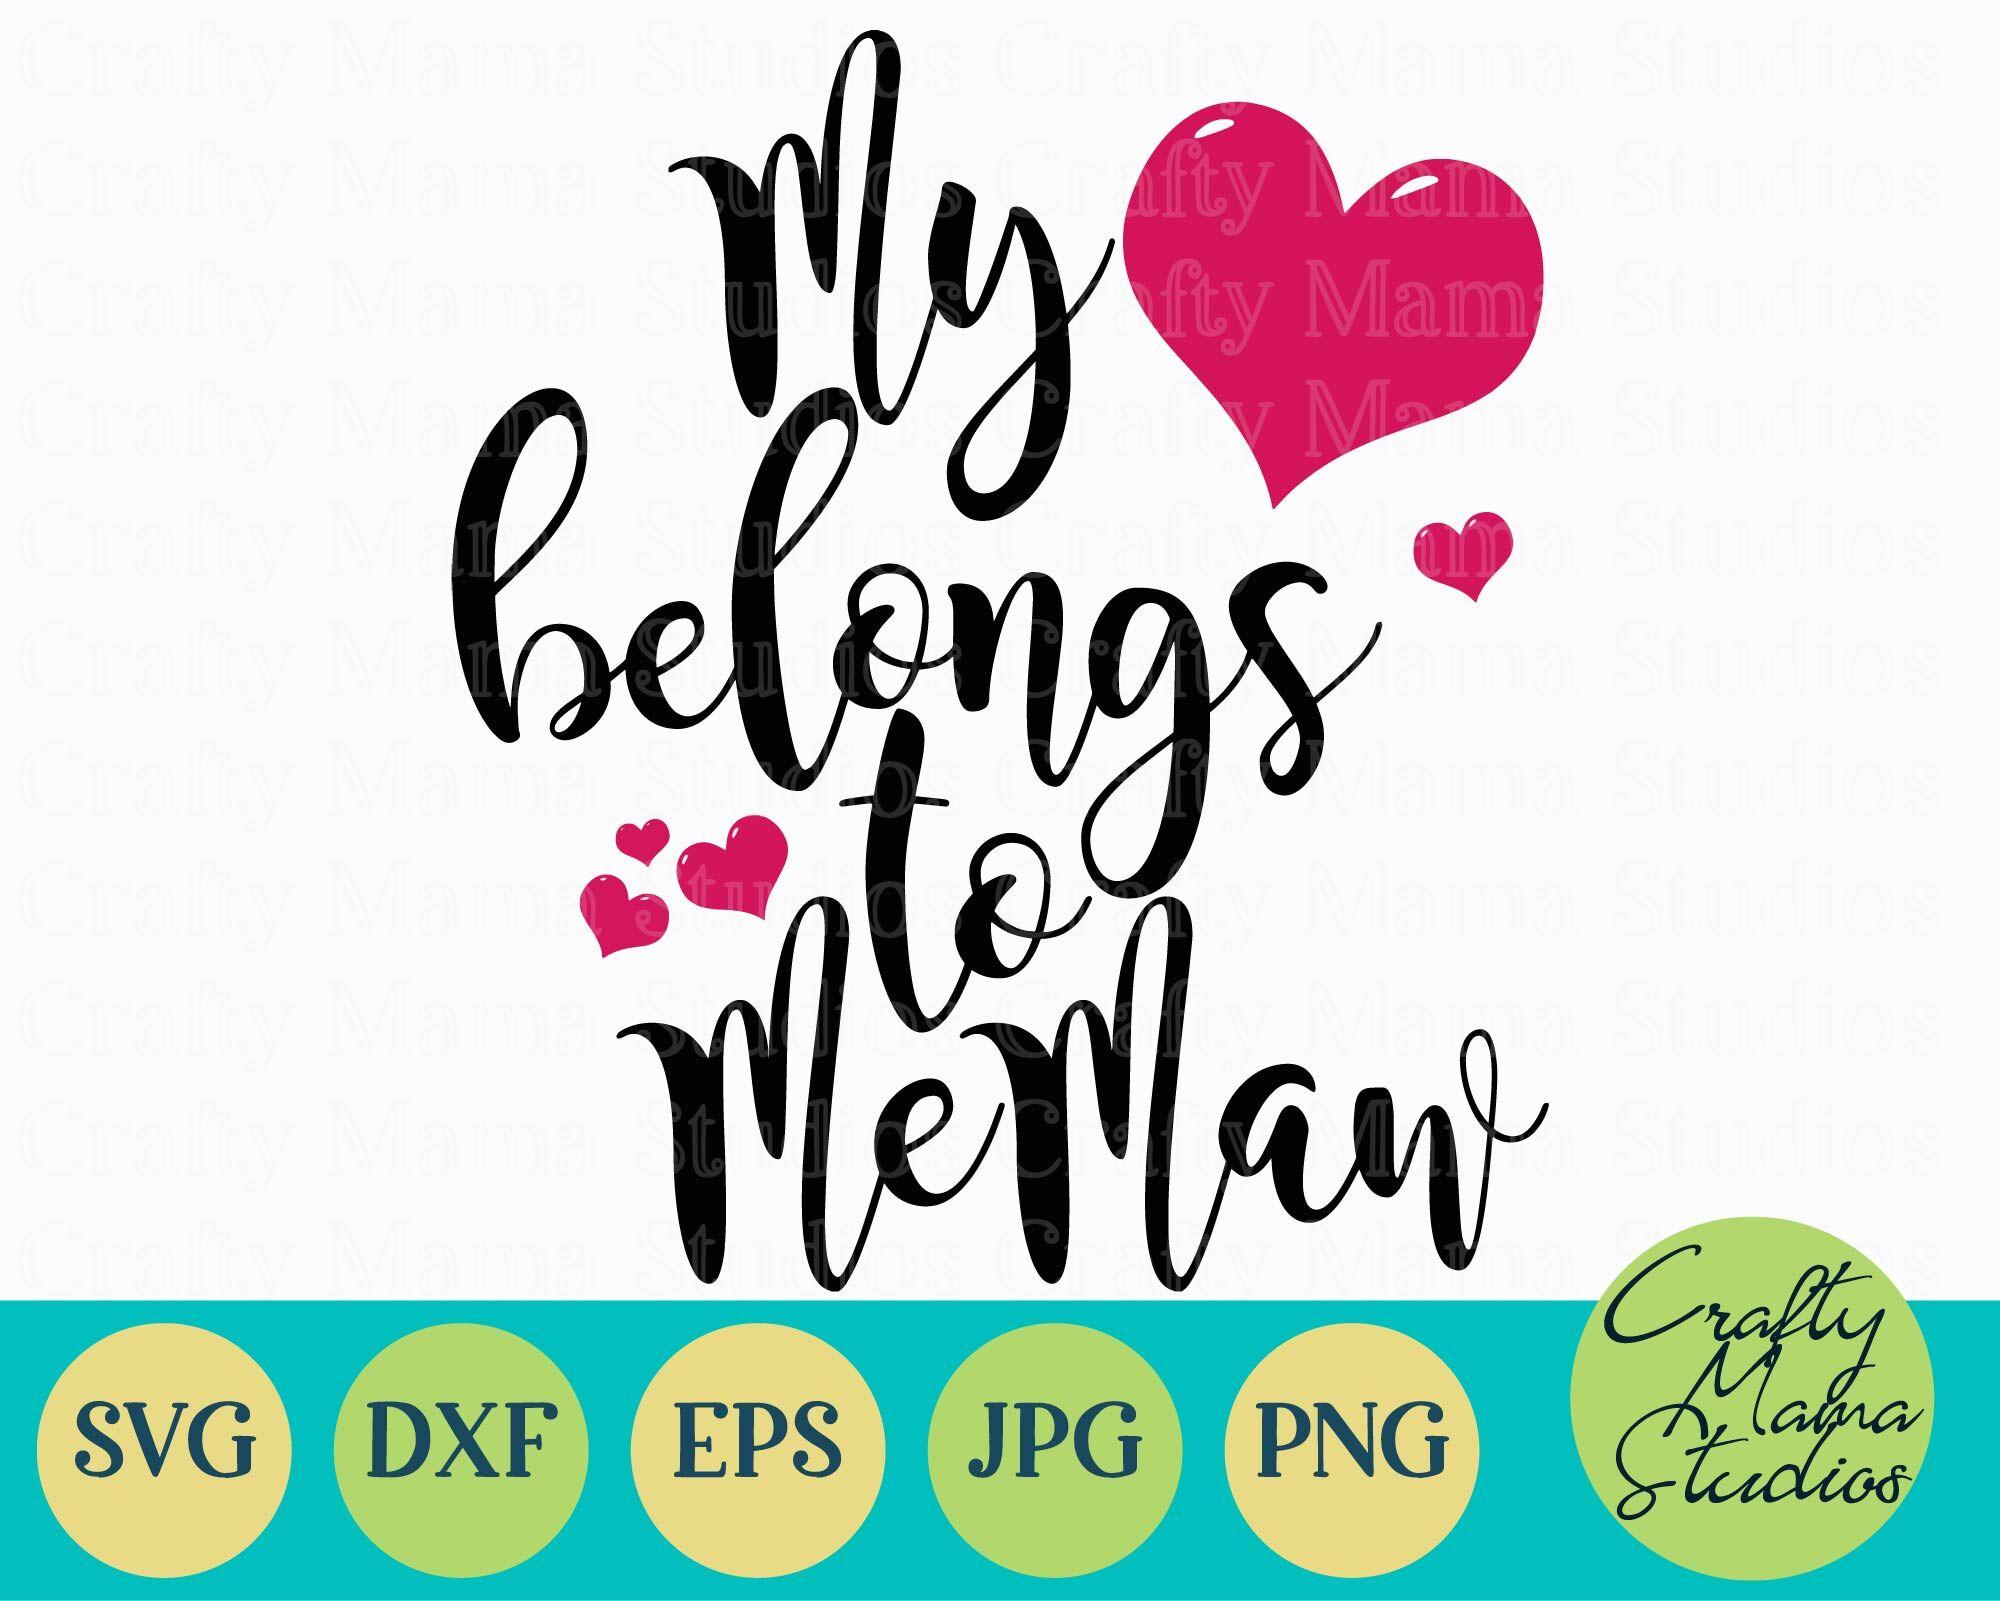 My Heart Belongs To Memaw Svg Grandma Svg By Crafty Mama Studios